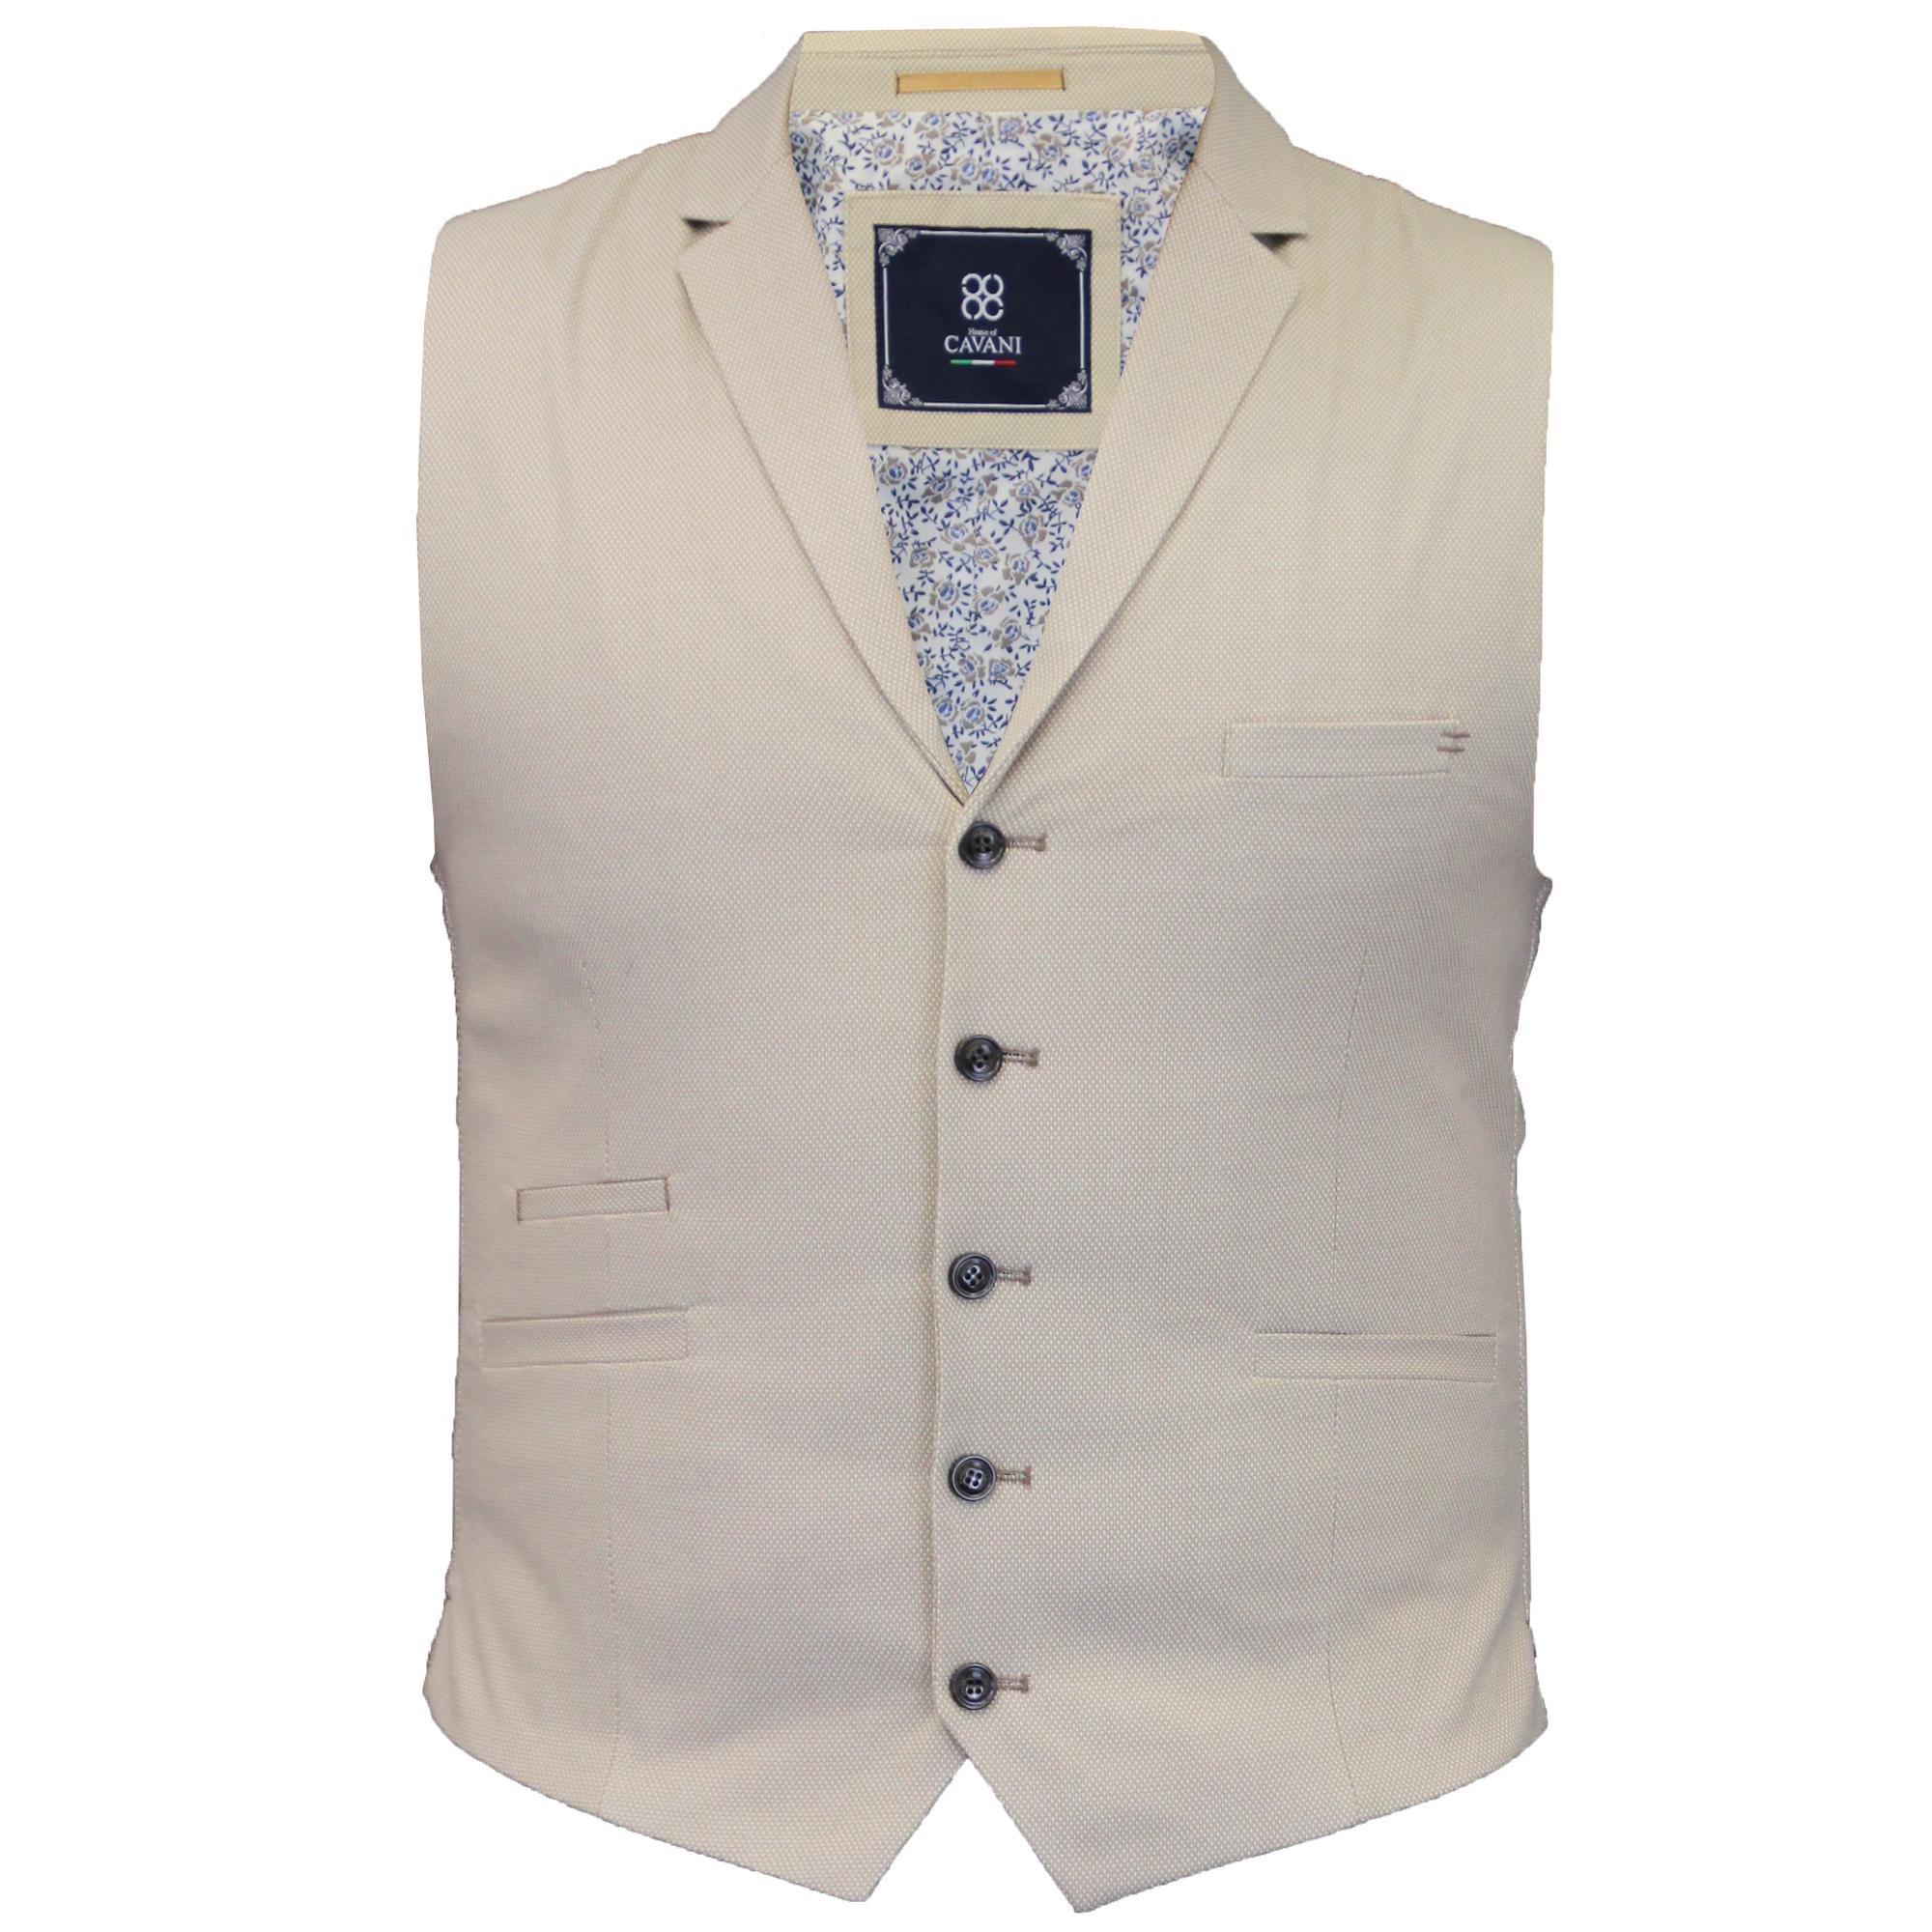 Mens-Waistcoat-Wool-Mix-Cavani-Formal-Vest-Herringbone-Tweed-Check-Party-Smart thumbnail 36